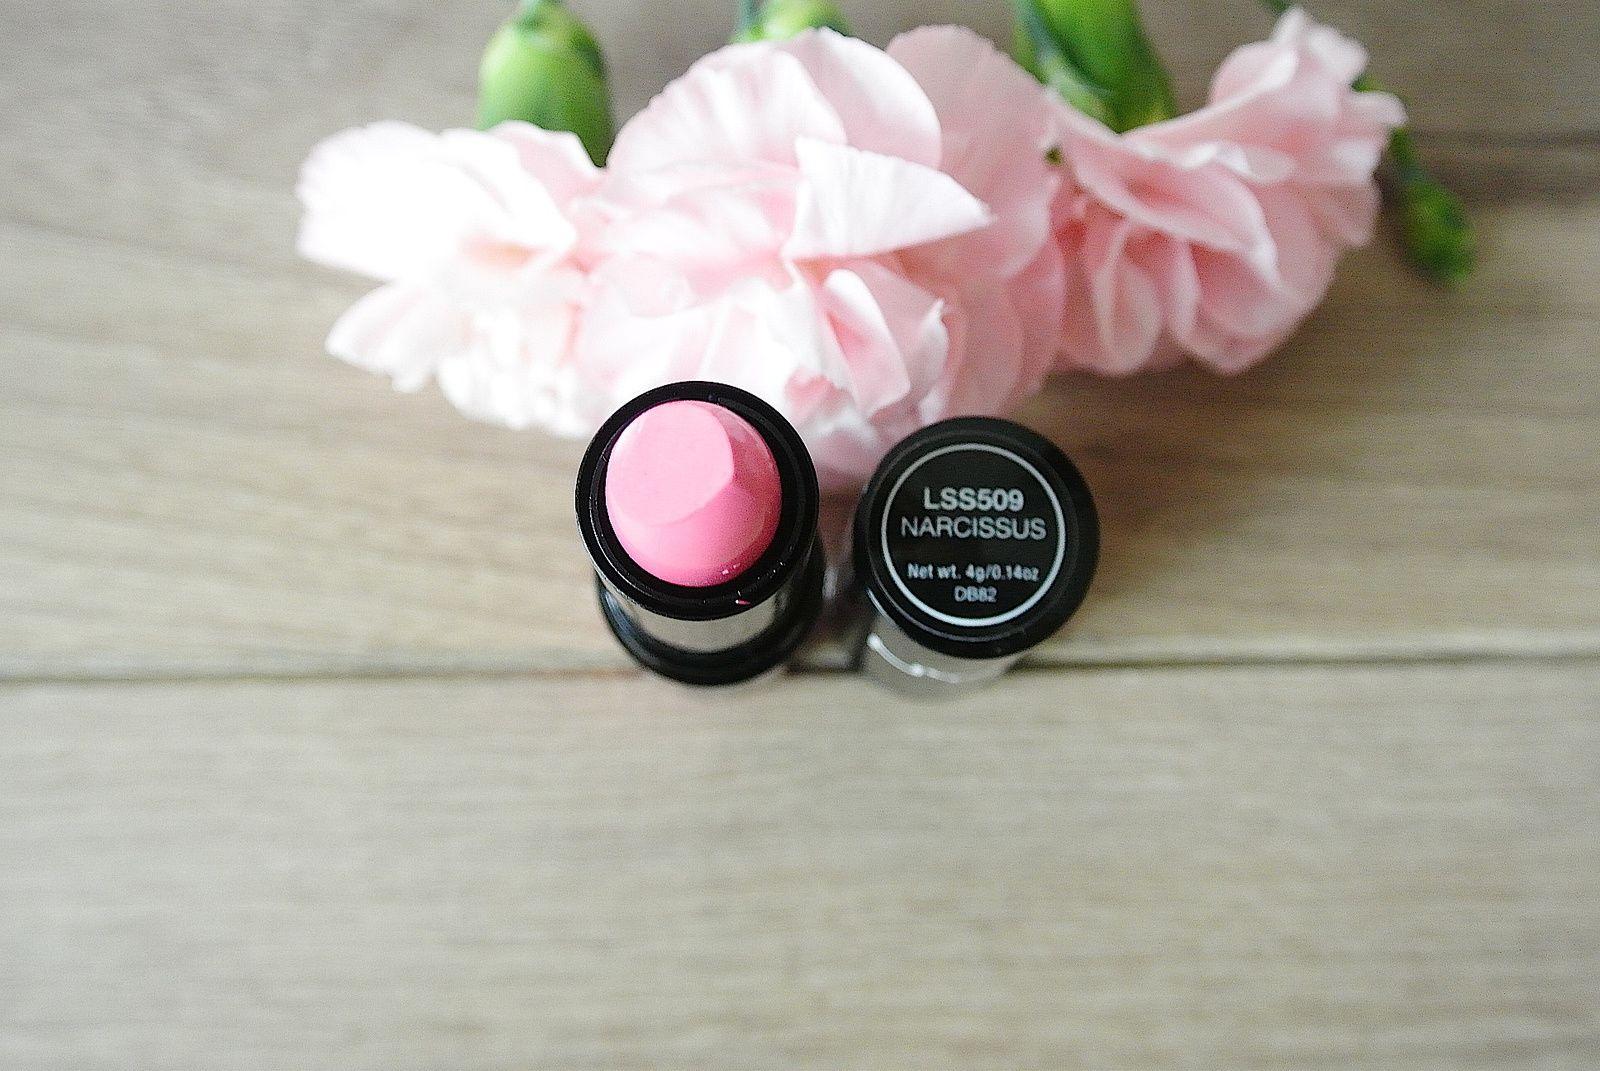 Narcissius Lipstick — NYX